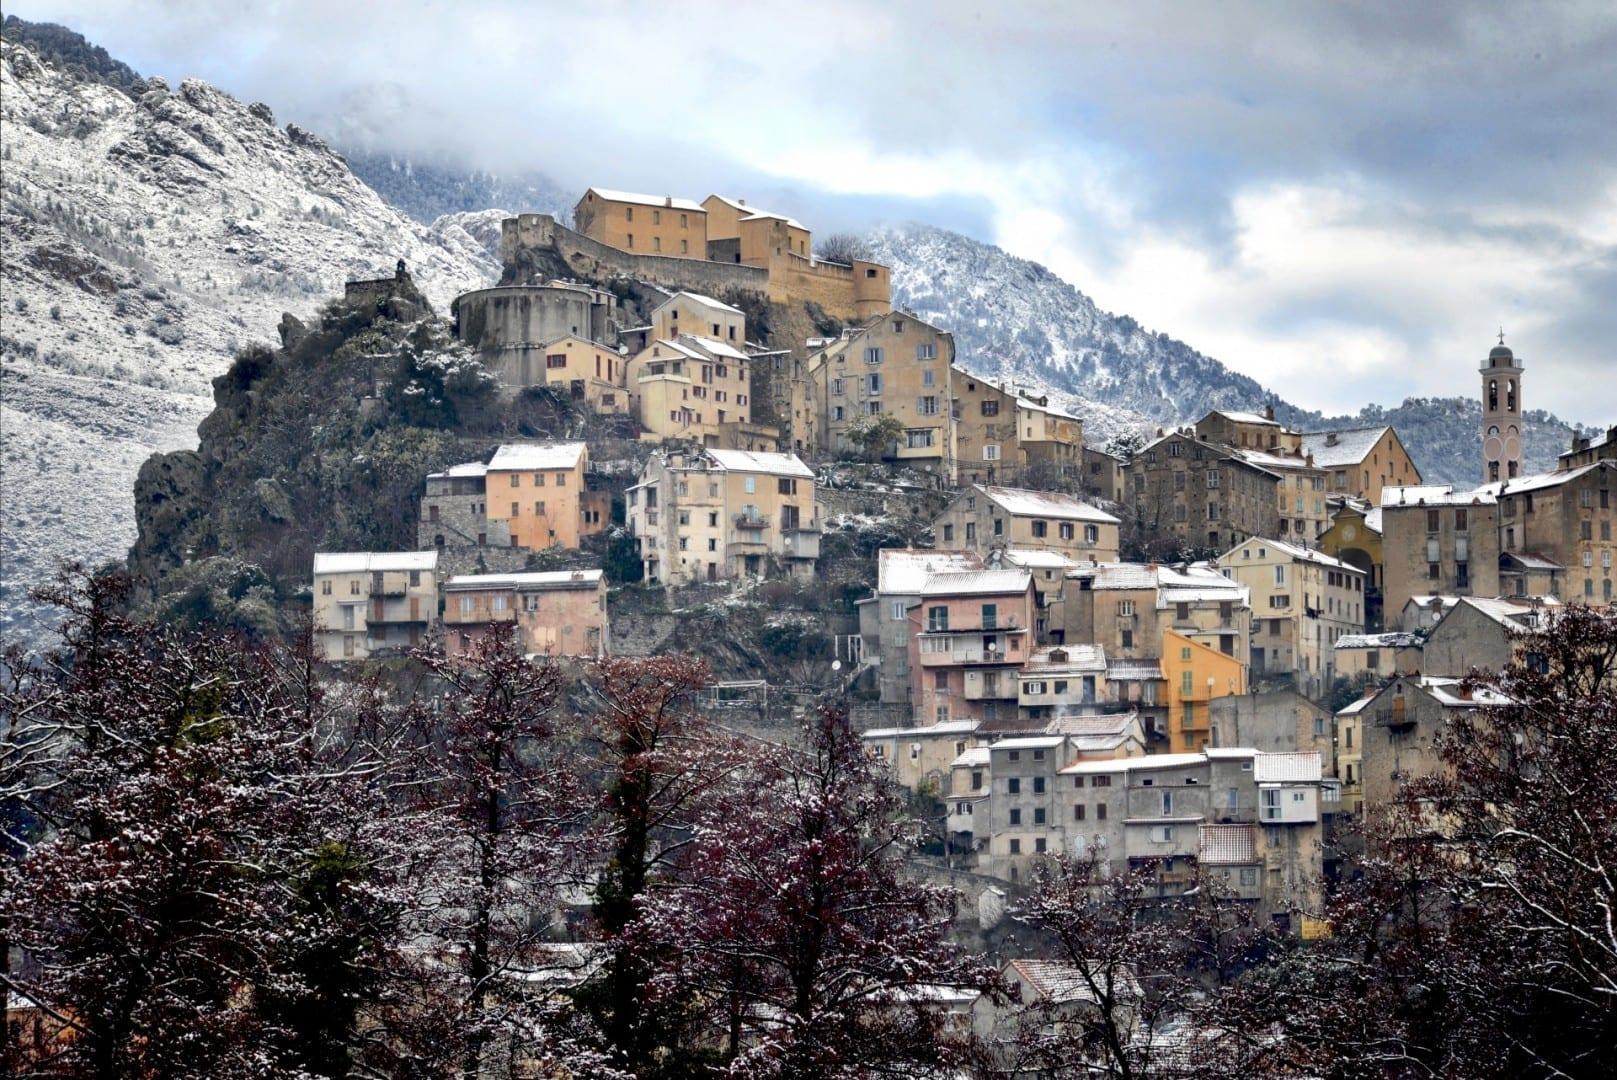 Corte en invierno Corte, Corsica Francia